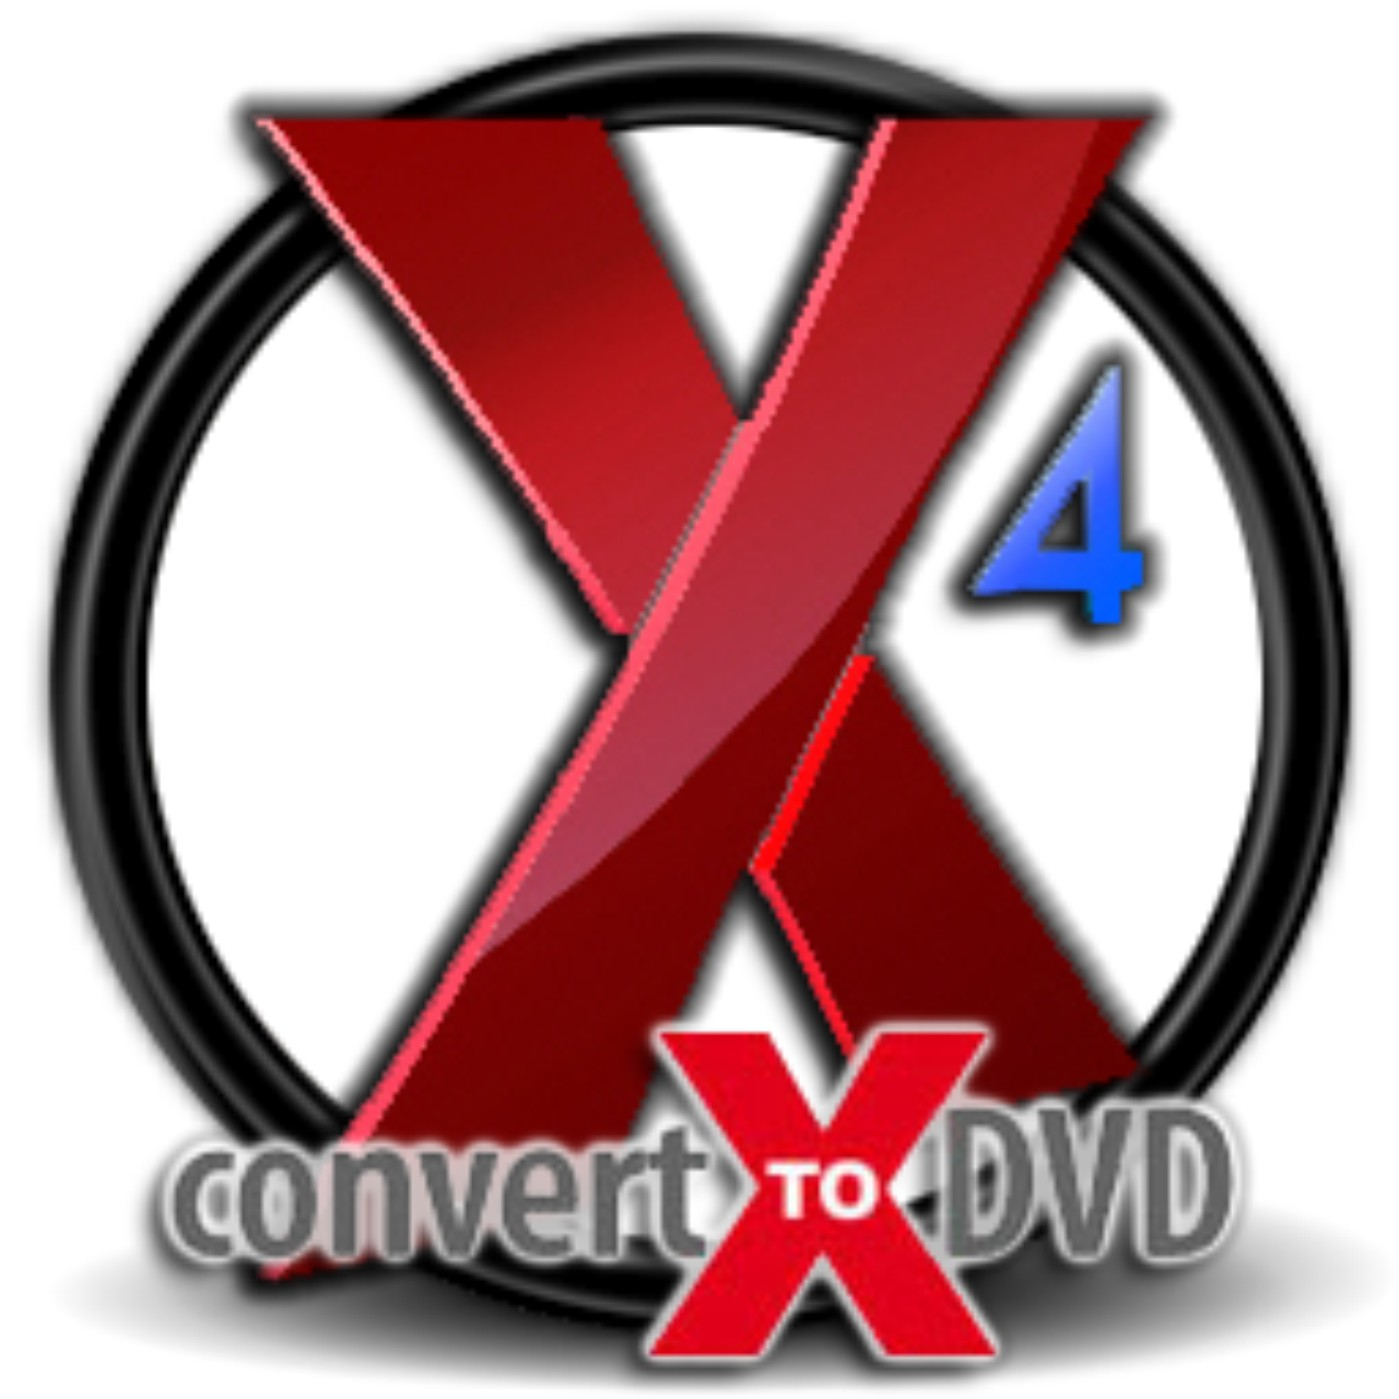 ConvertXtoDVD 4 rus + ключ.